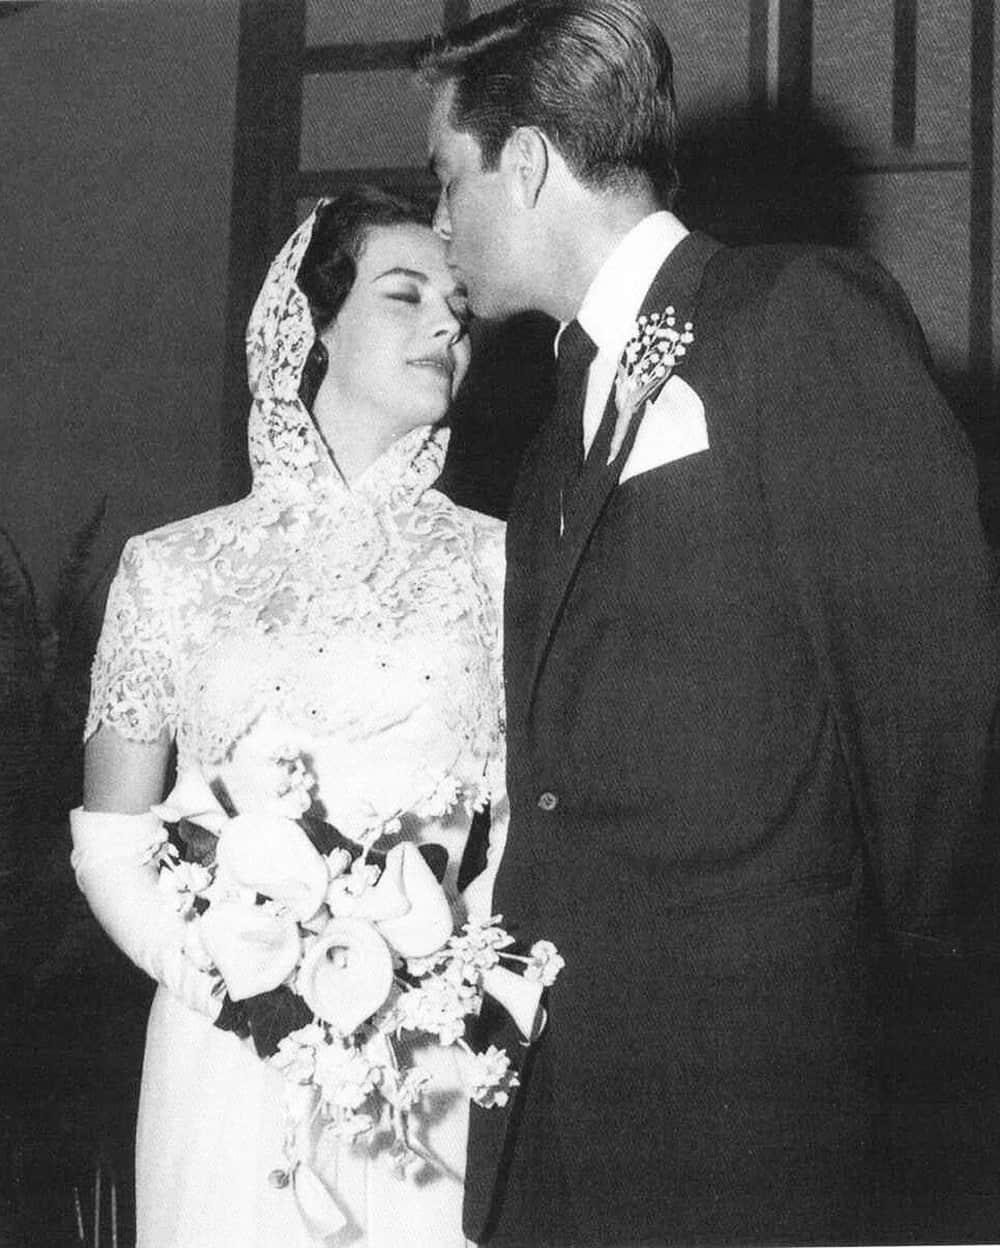 Wedding of Natalie Wood.